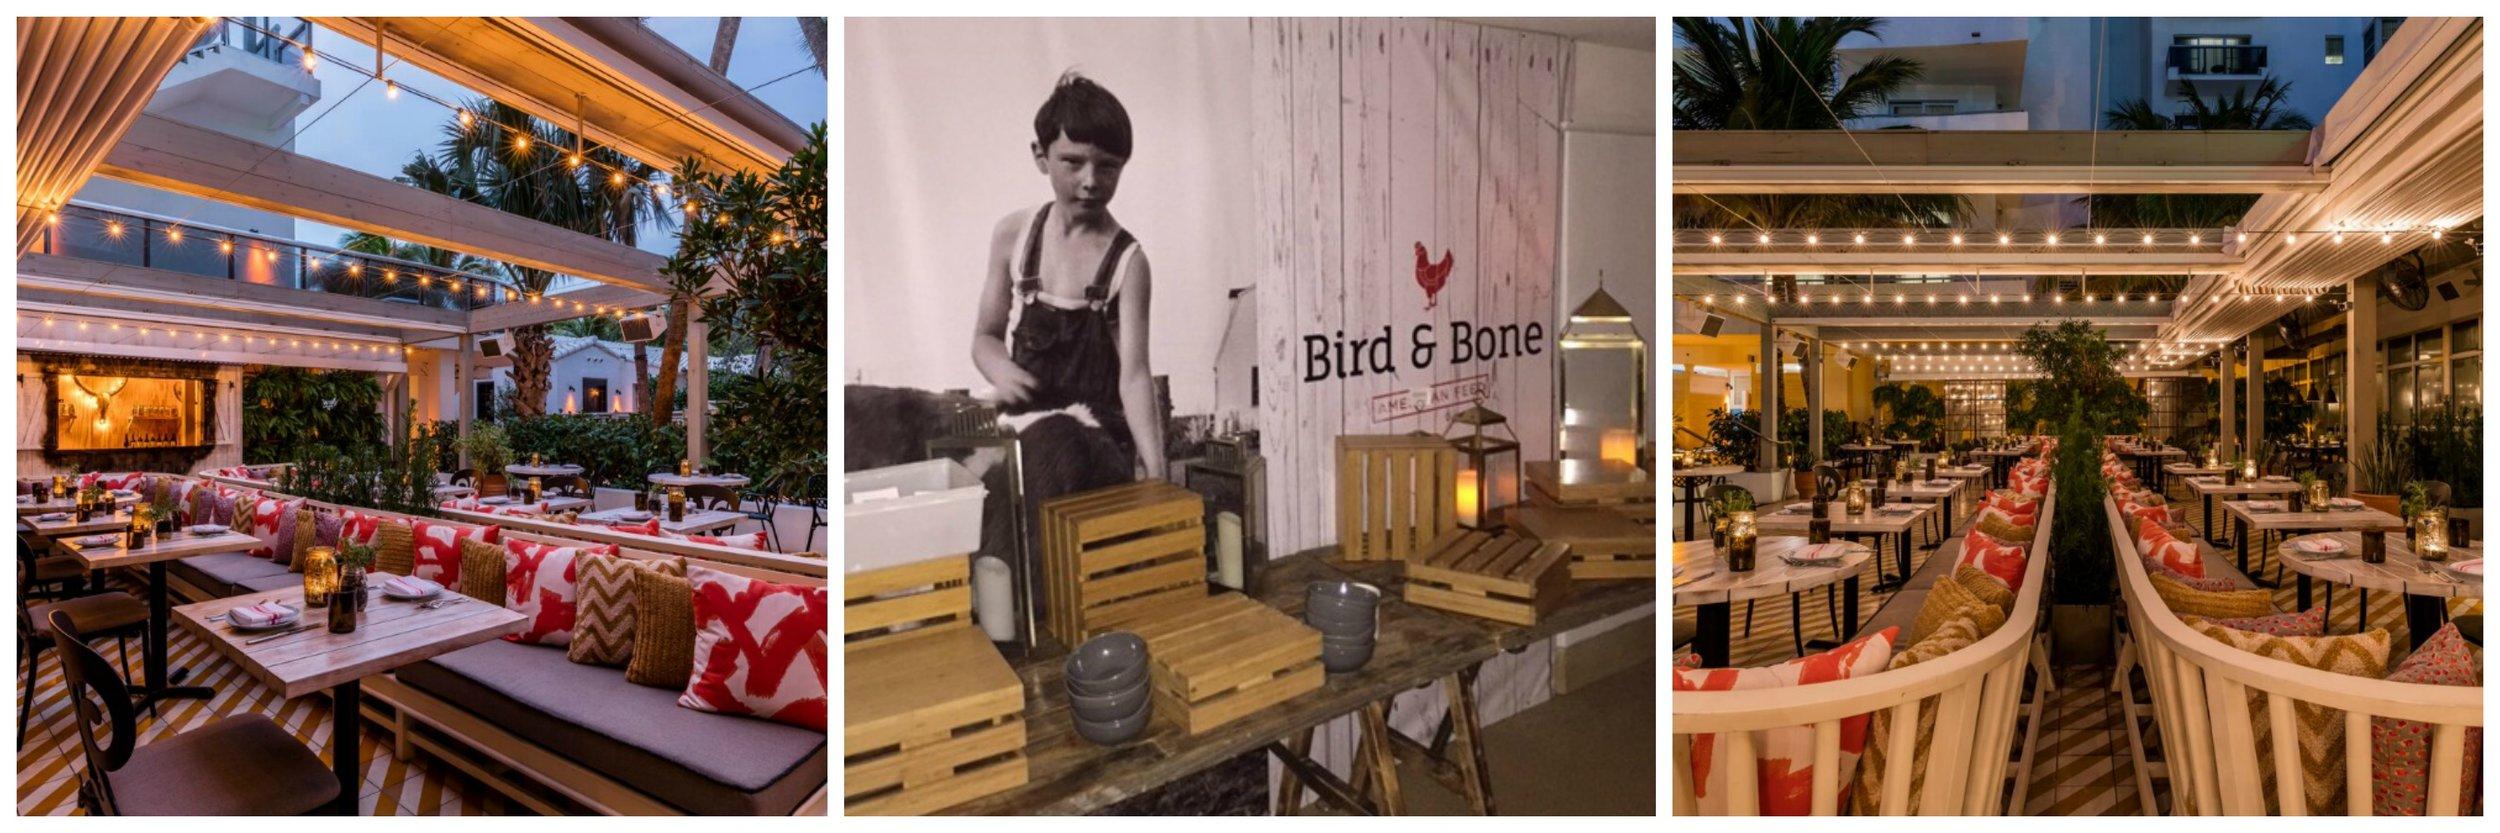 Bird & Bone Miami Beach Confidante Hotel